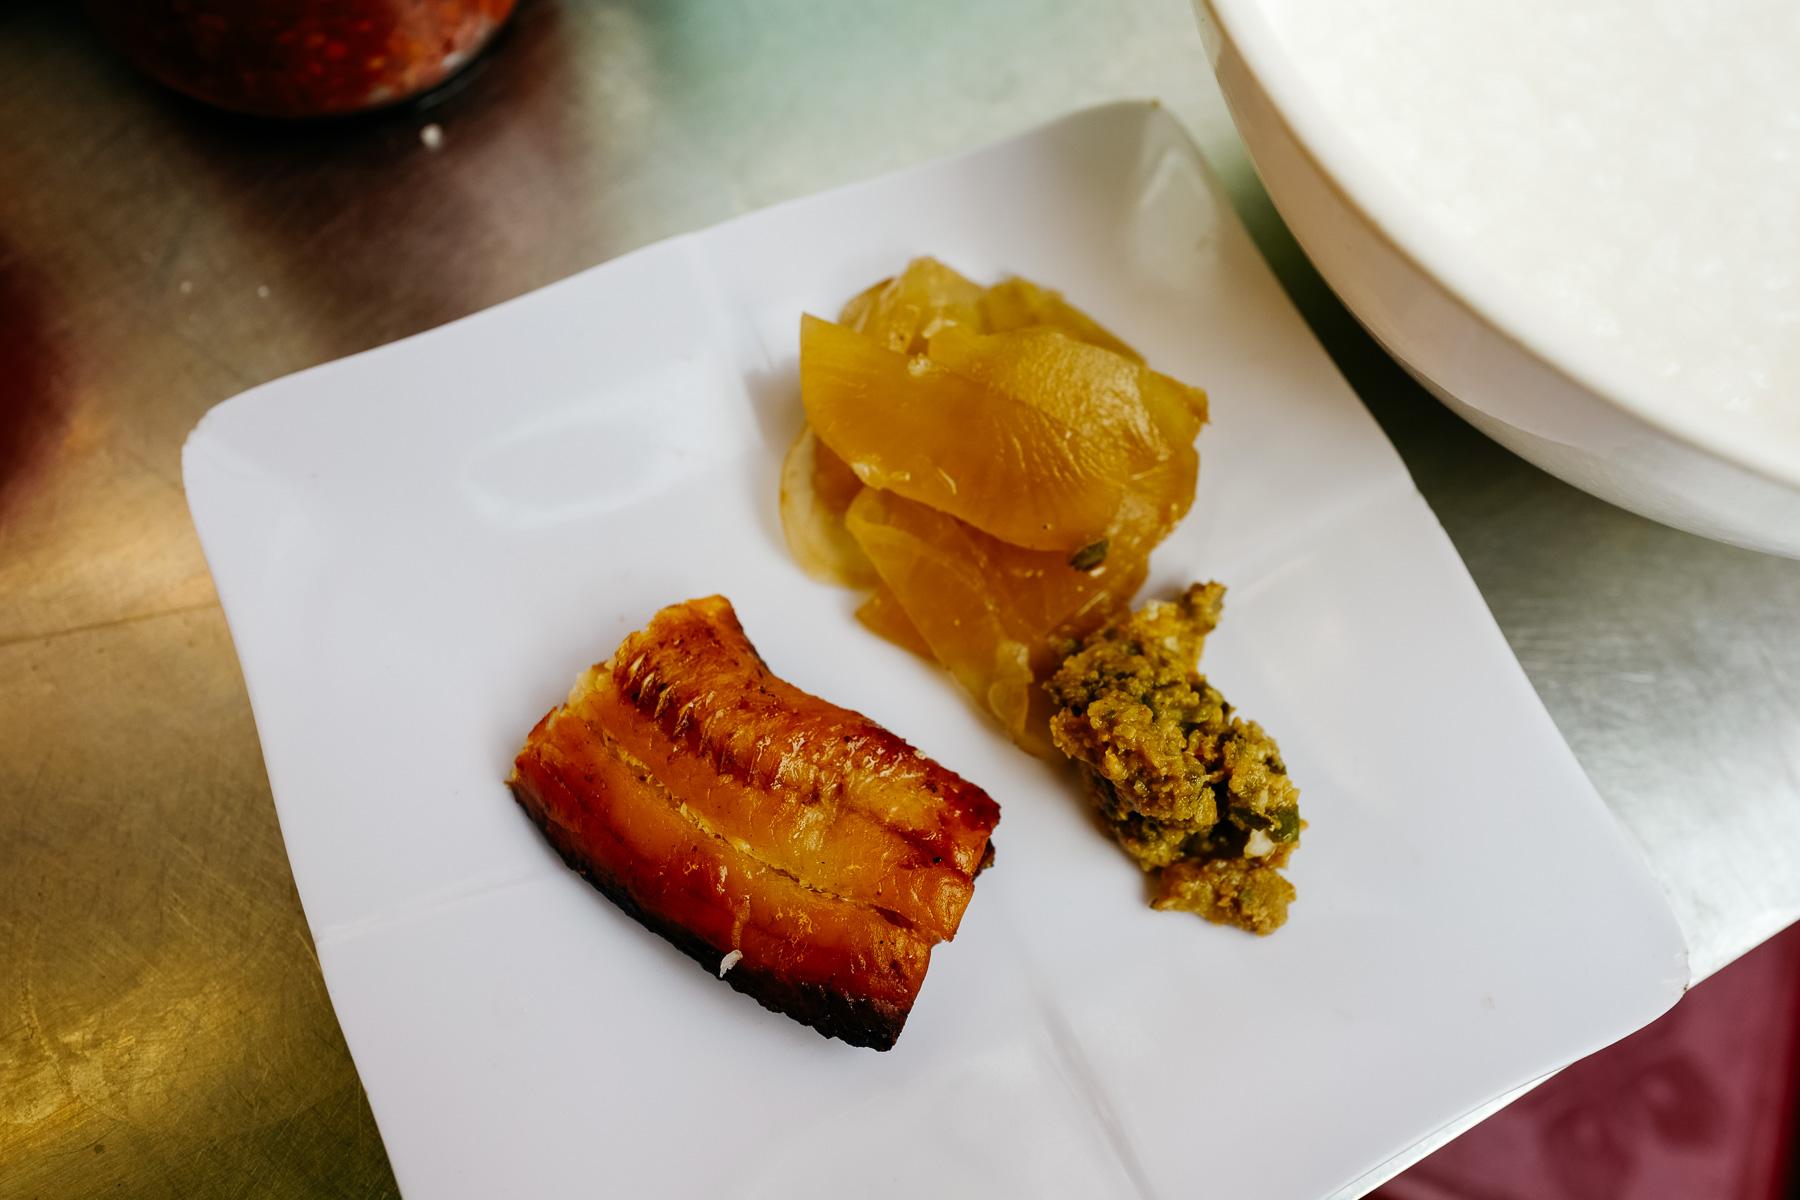 Kleik ryżowy z rybą (Bobosor Trey Ngeat, បបរសត្រីអាំង)